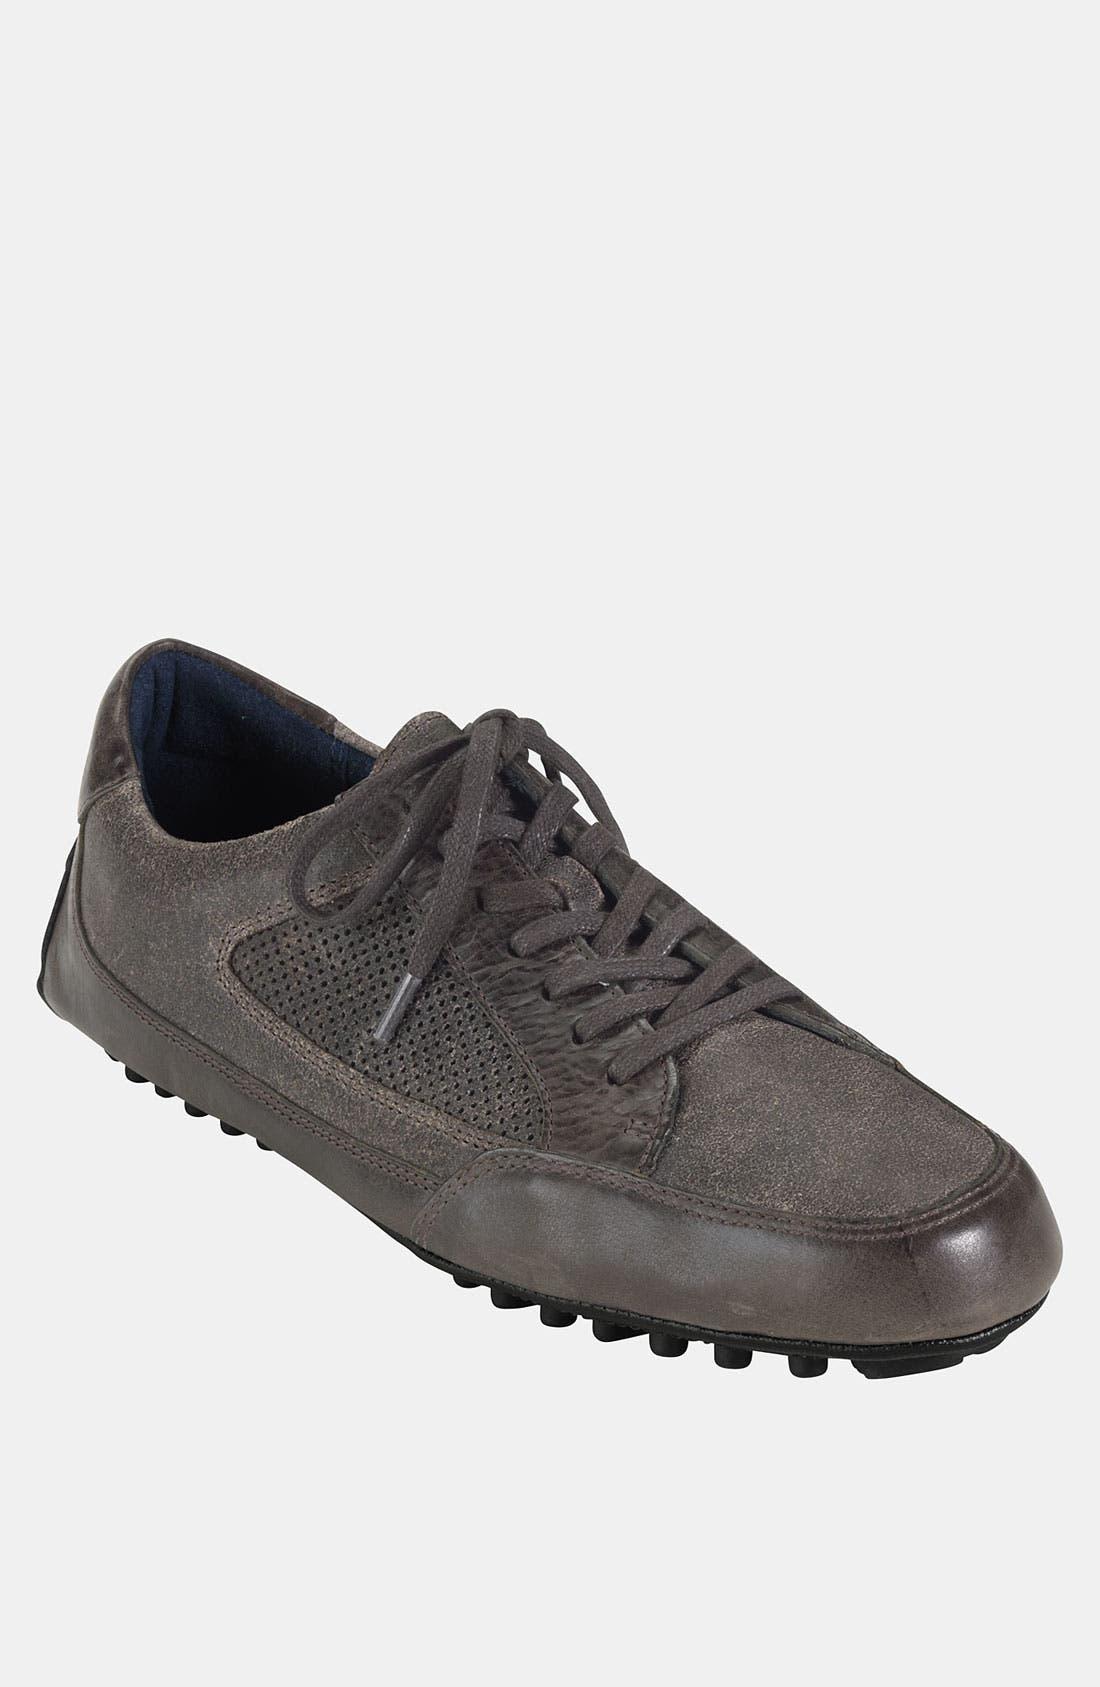 Alternate Image 1 Selected - Cole Haan 'Air Grant' Sneaker